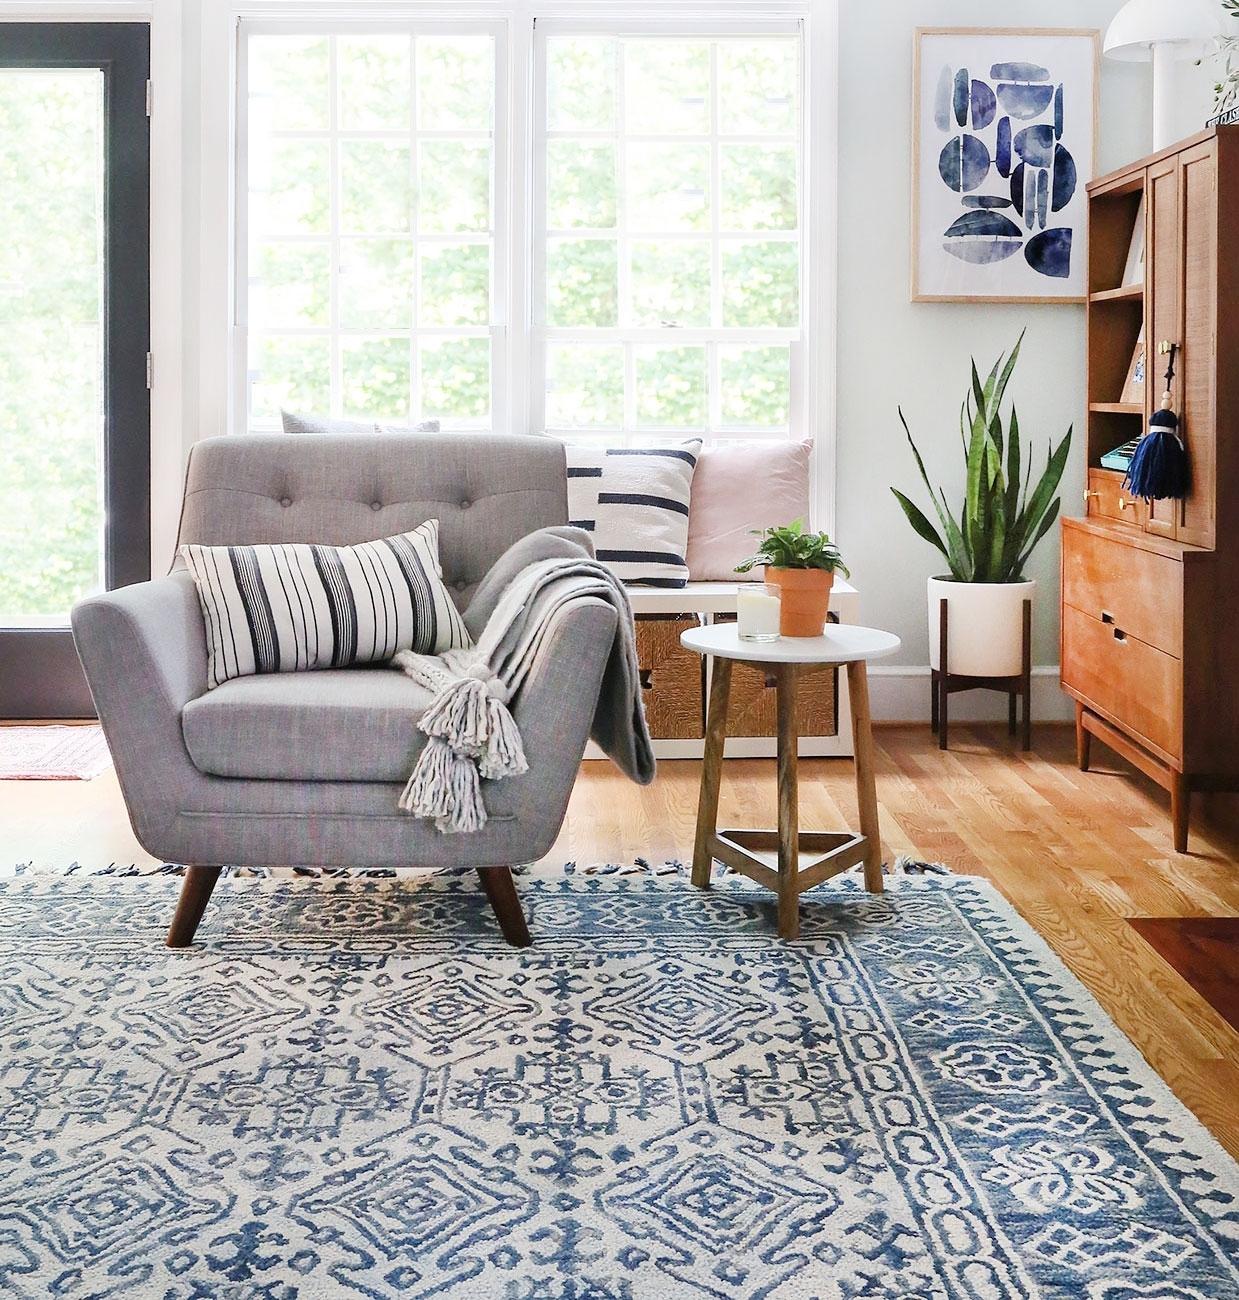 living-room-chair.jpg